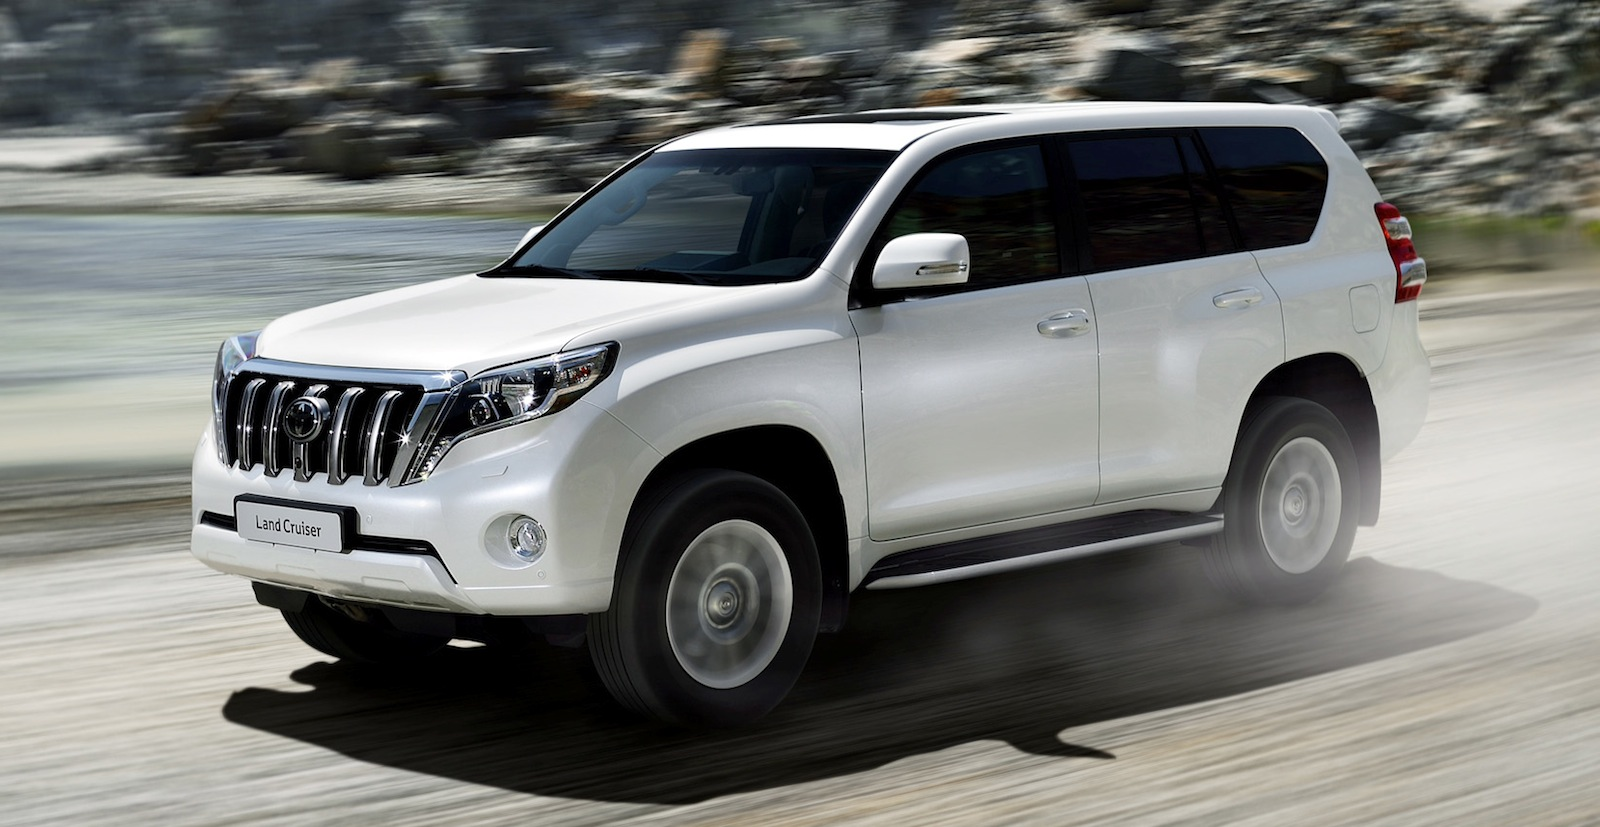 Should I Buy the Mitsubishi Pajero or Toyota Prado? — Auto